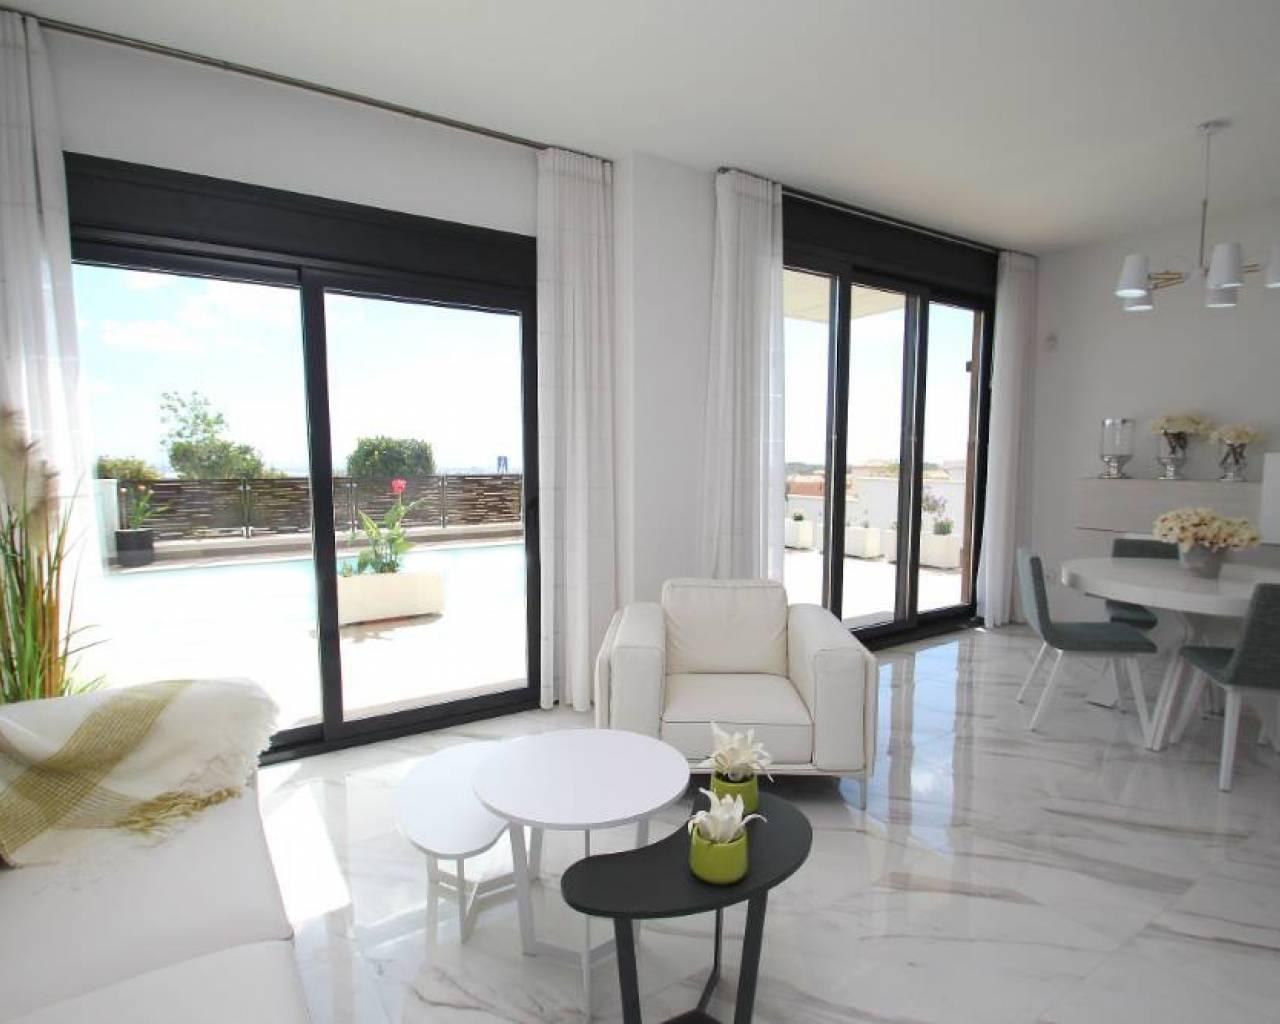 nieuwbouw-appartement-san-miguel-de-salinas_317_xl